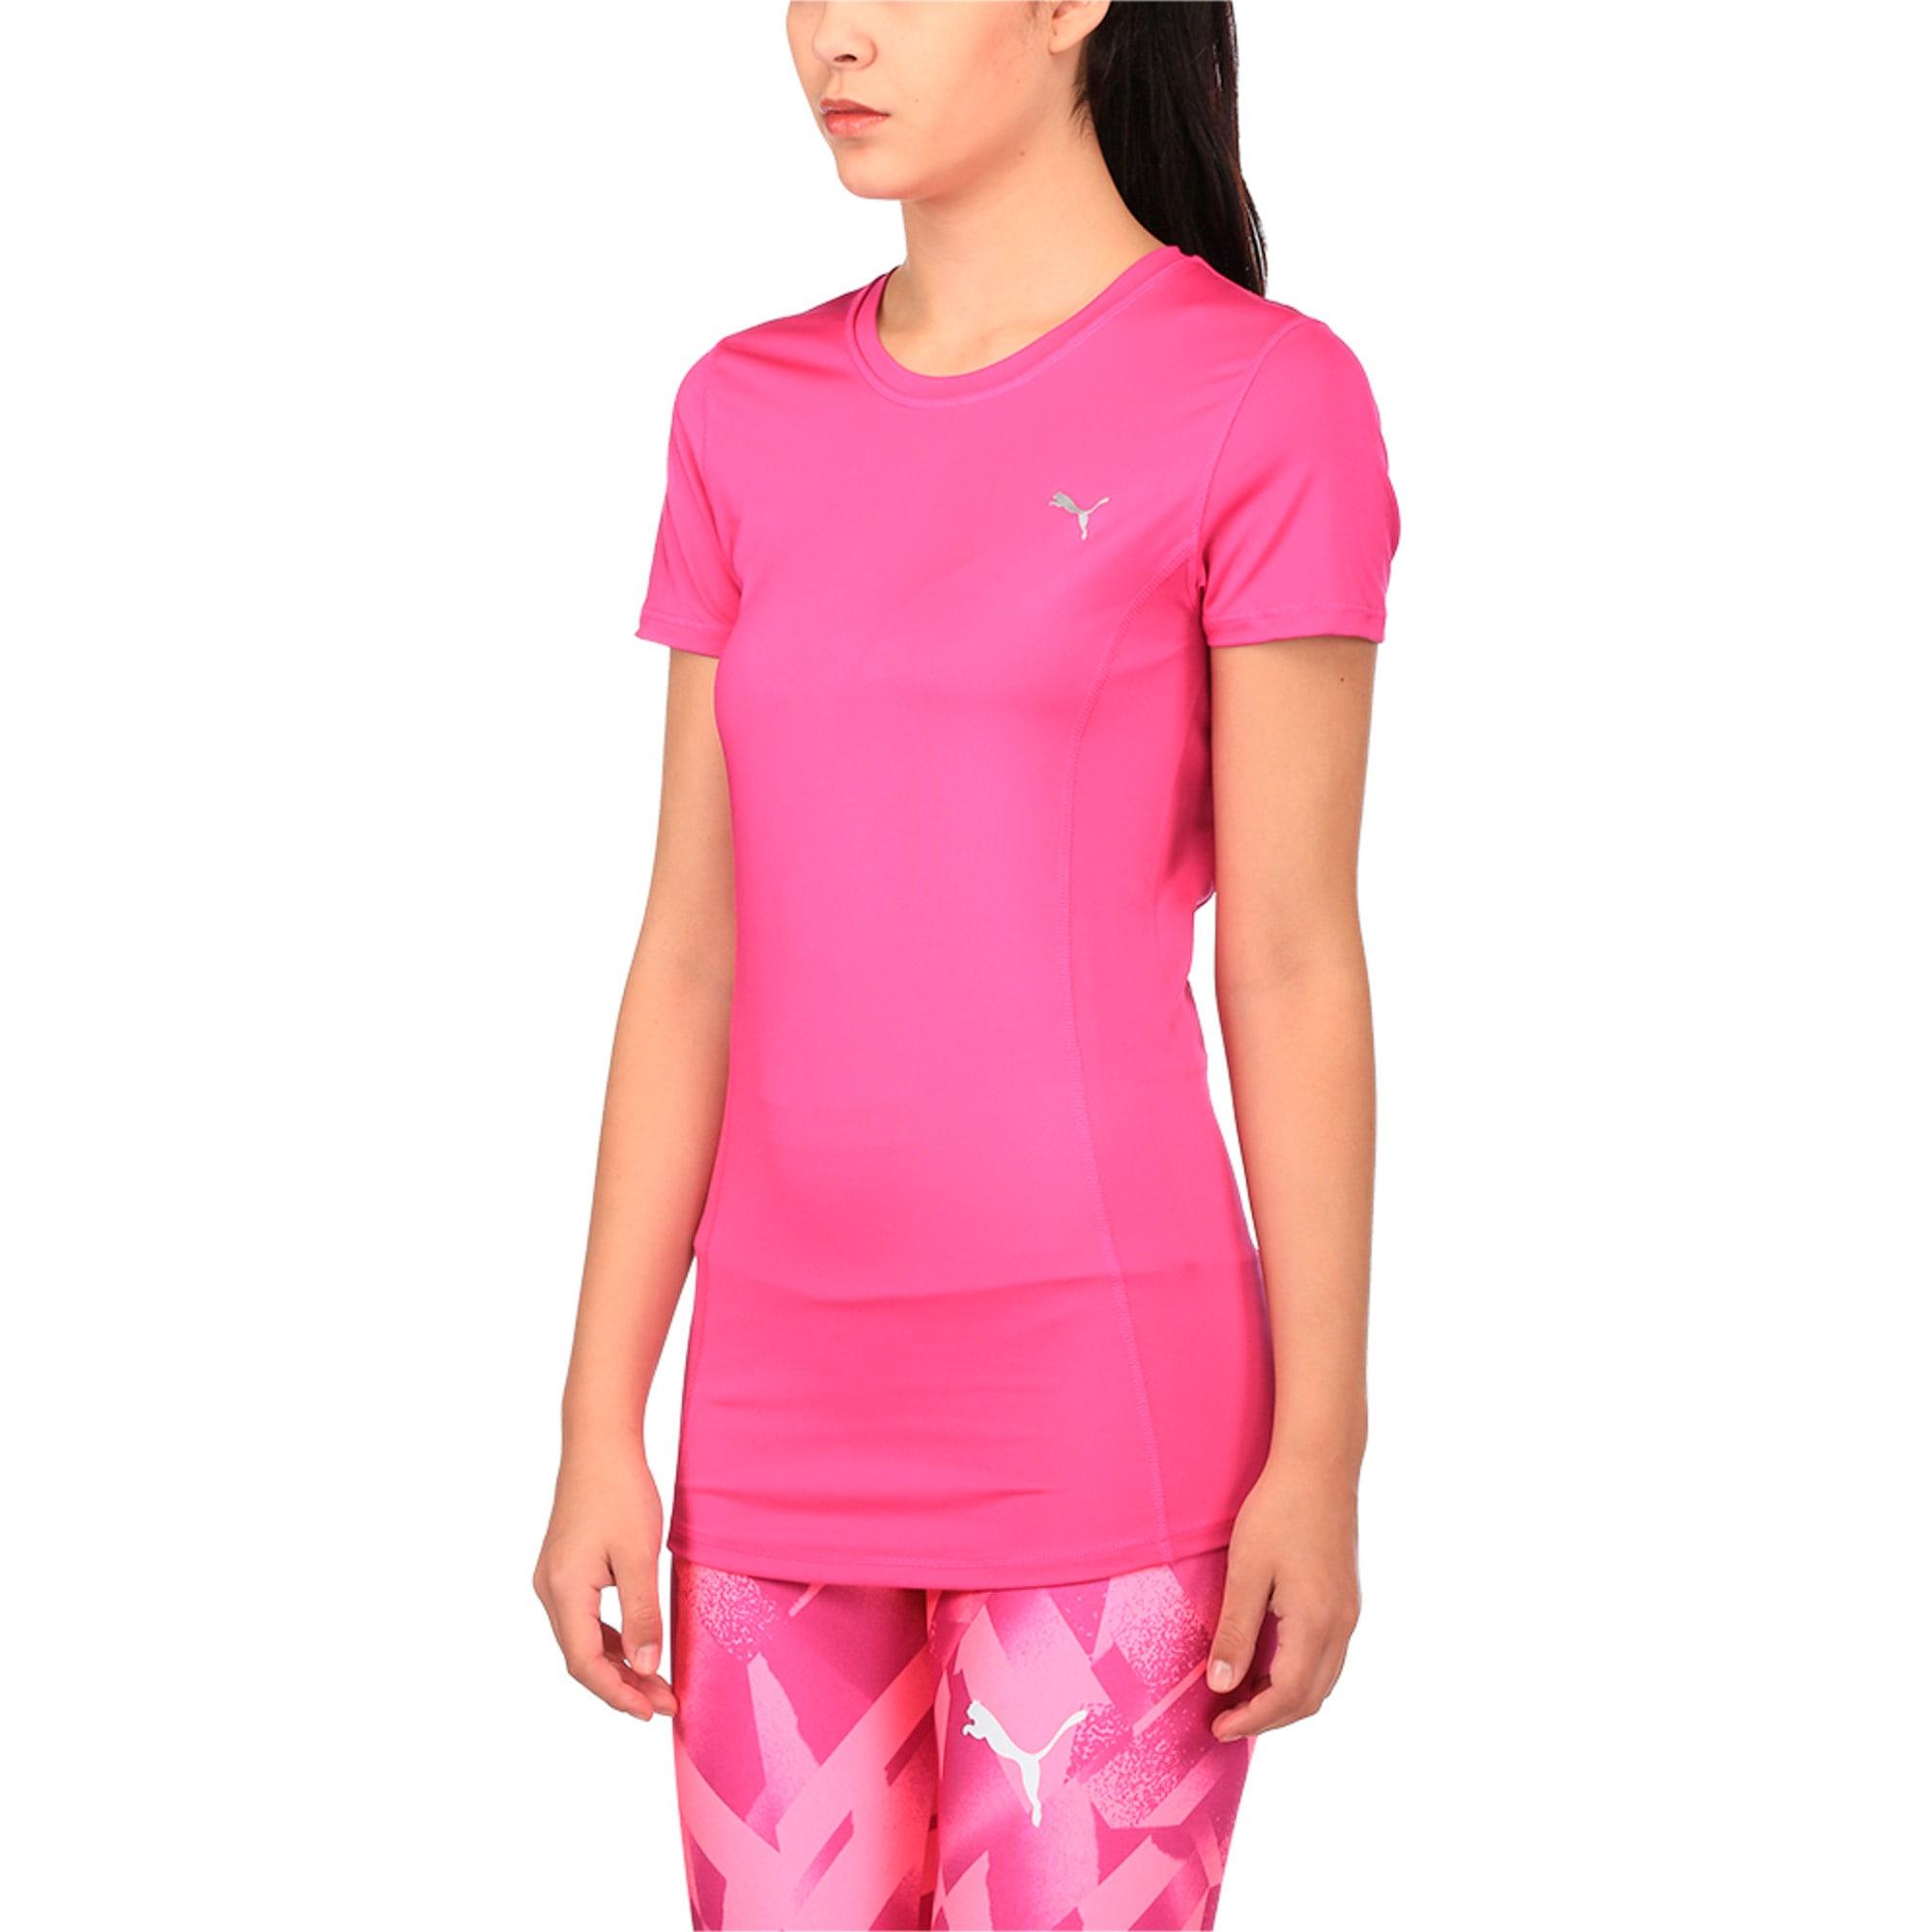 Thumbnail 2 of Training Women's Essential T-Shirt, ULTRA MAGENTA, medium-IND